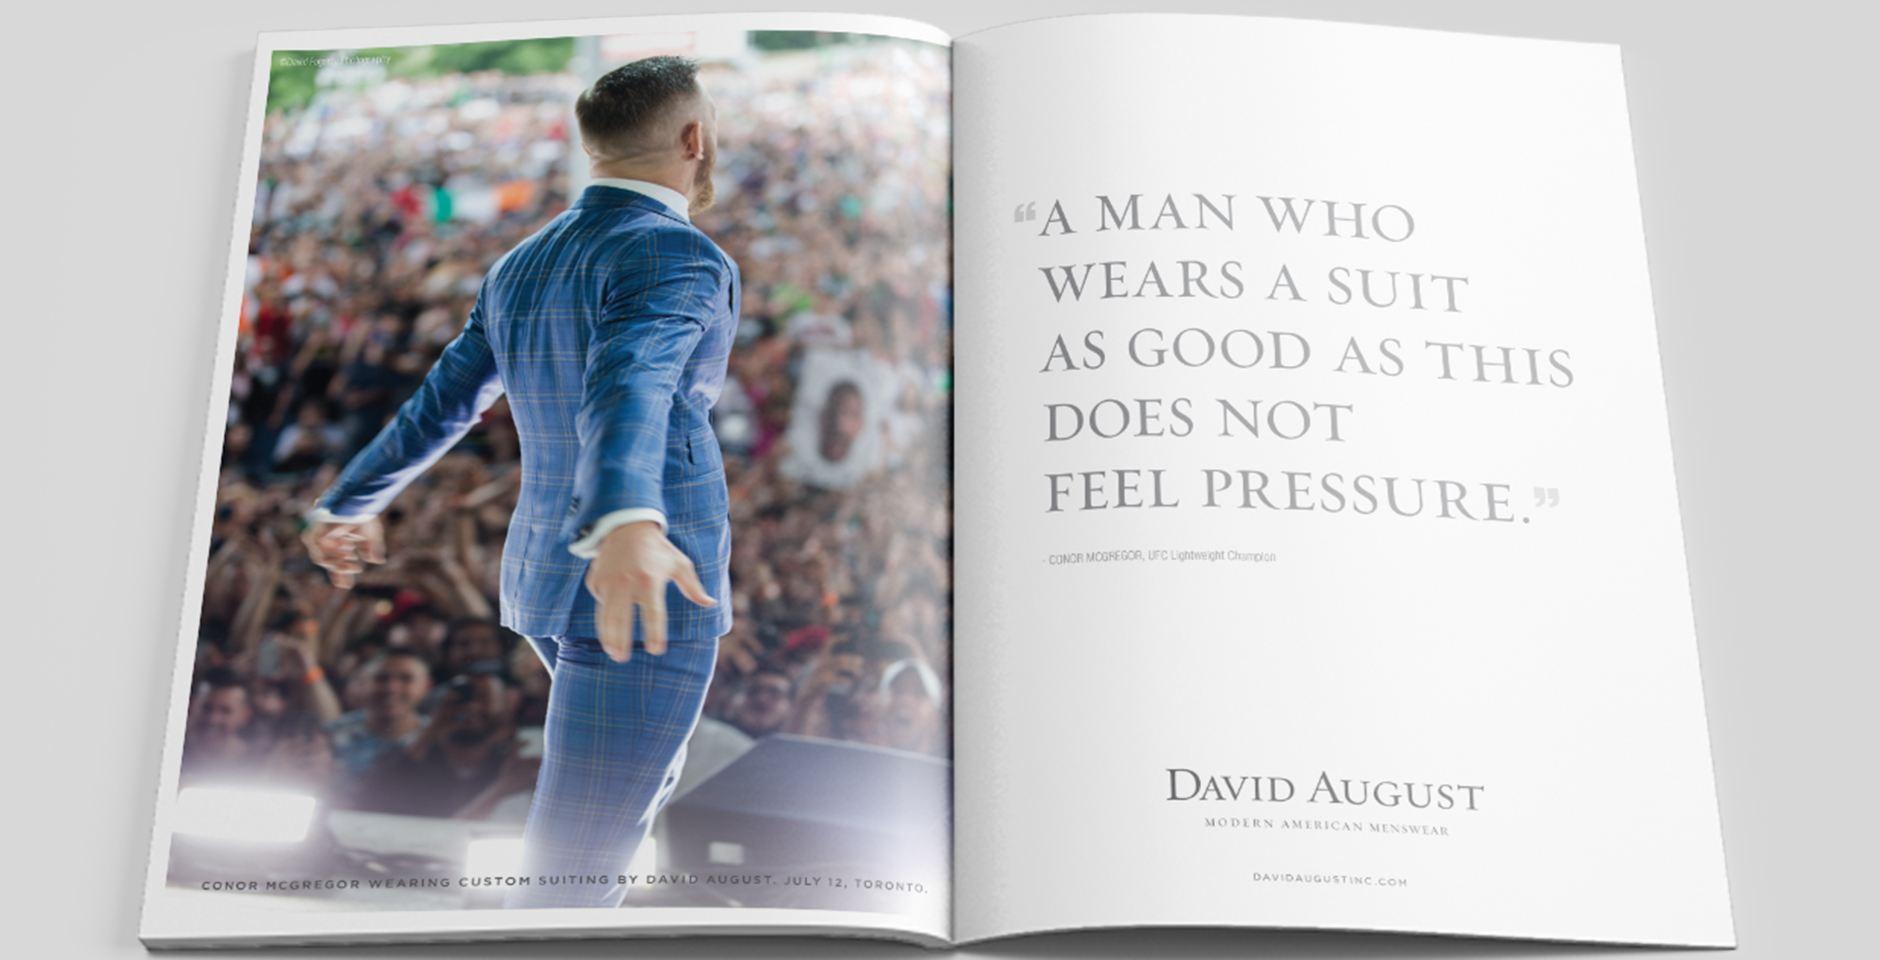 david august conor mcgregor magazine spread blue suit promotion fight